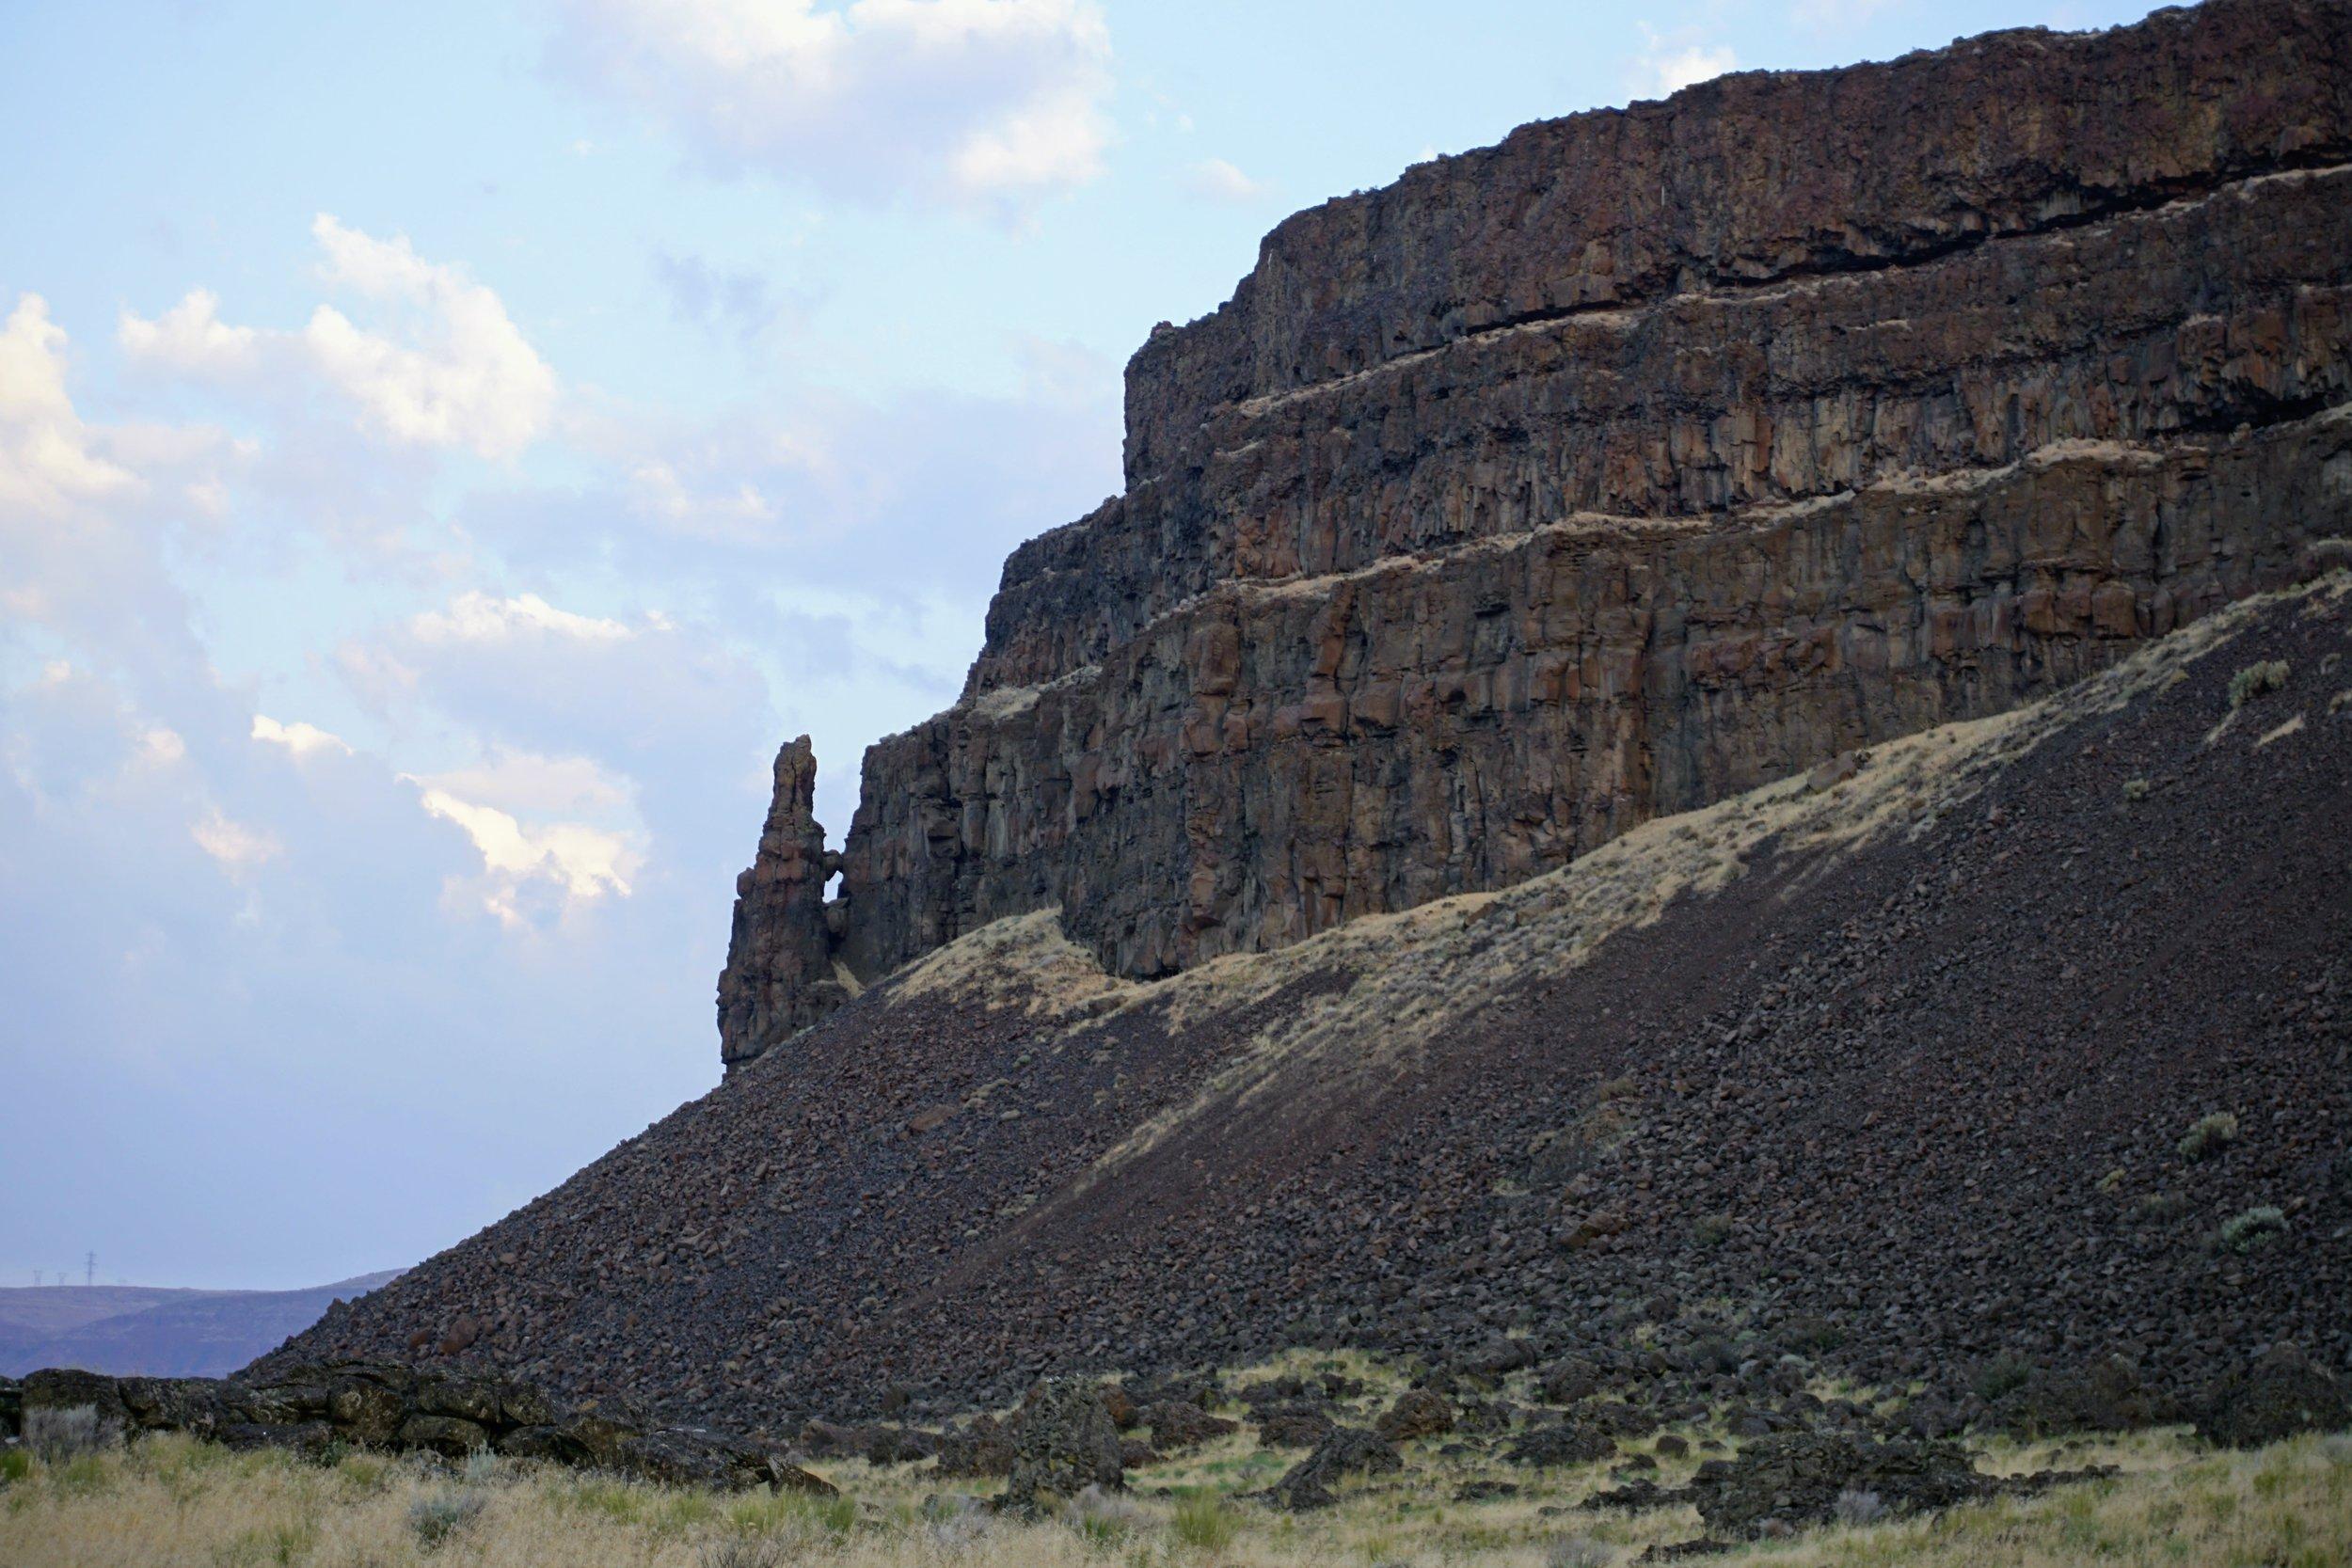 Western point of Umatilla Rock